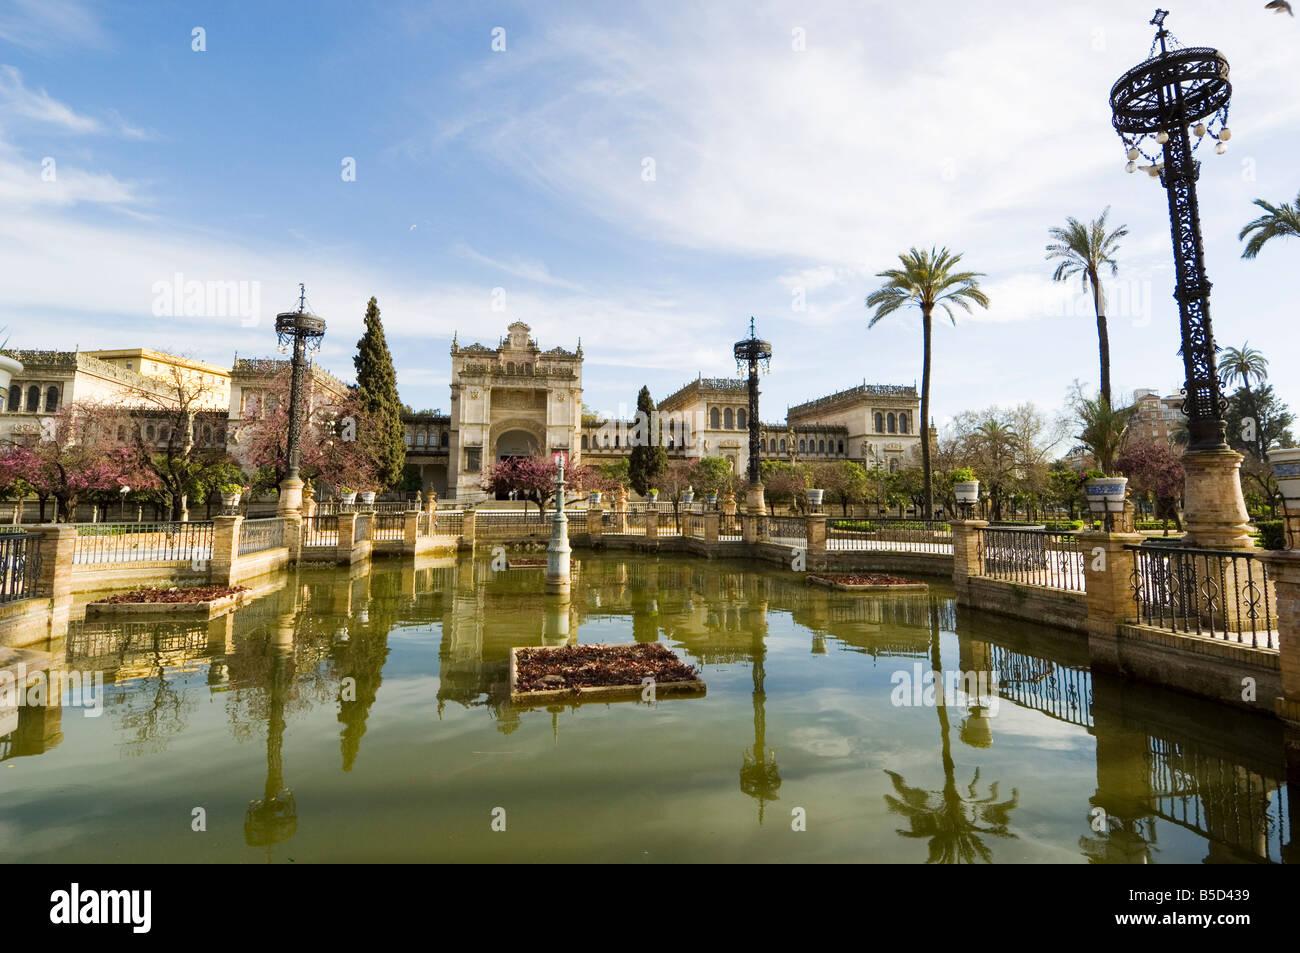 Neo Renaissance Pavellon, The Museum of Archaeology, Plaza de America, Parque Maria Luisa, Seville, Andalusia, Spain - Stock Image